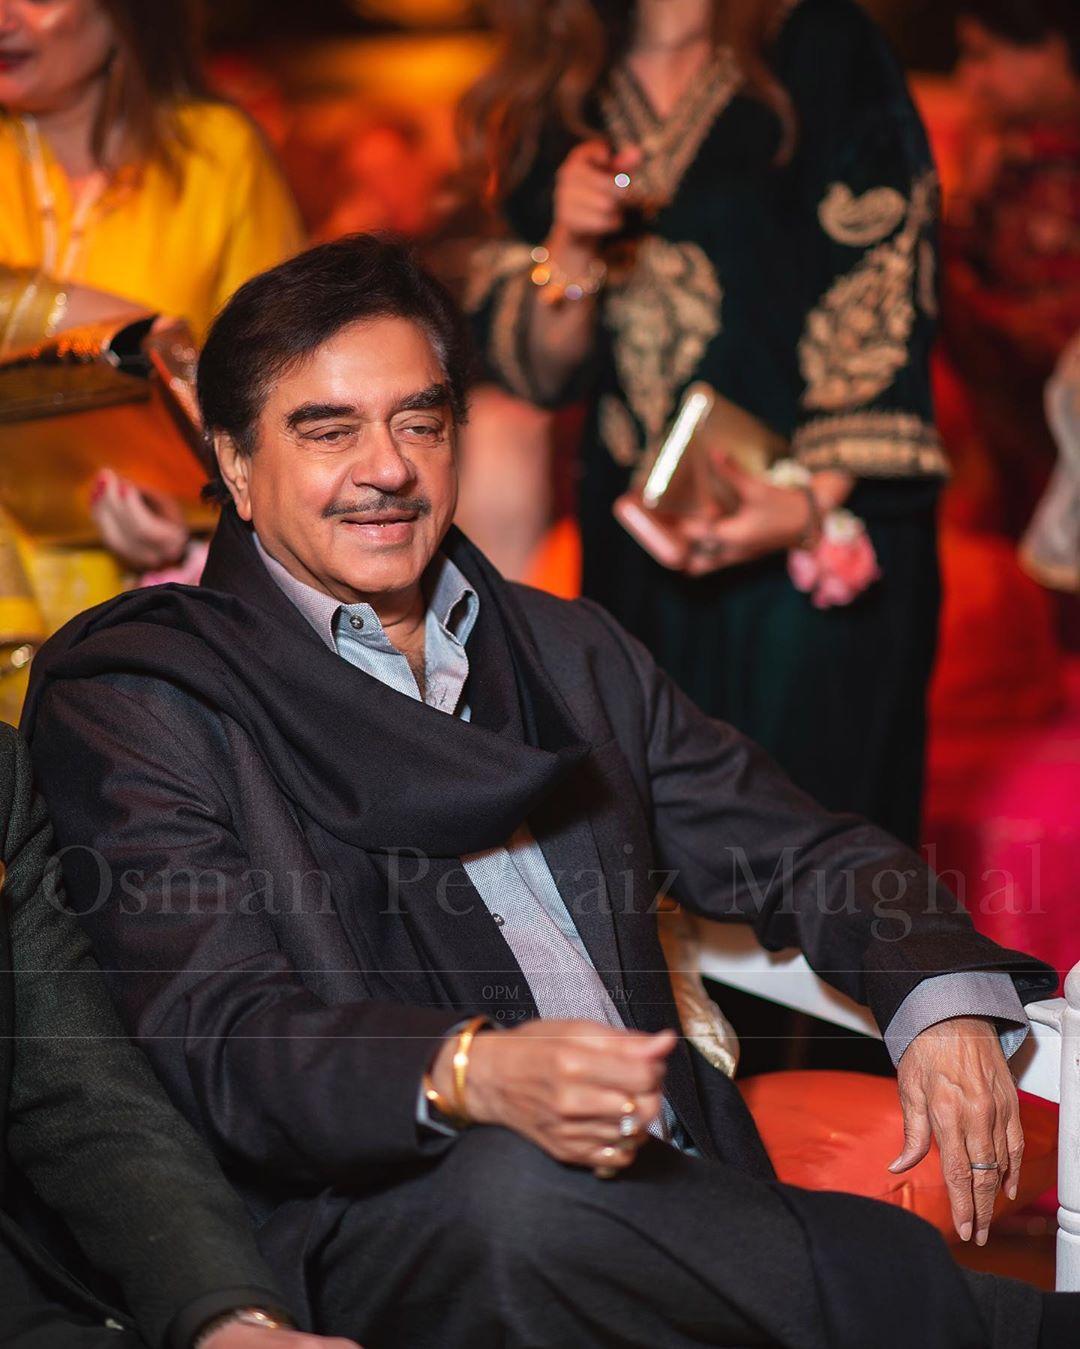 indian star at pakistani wedding 10